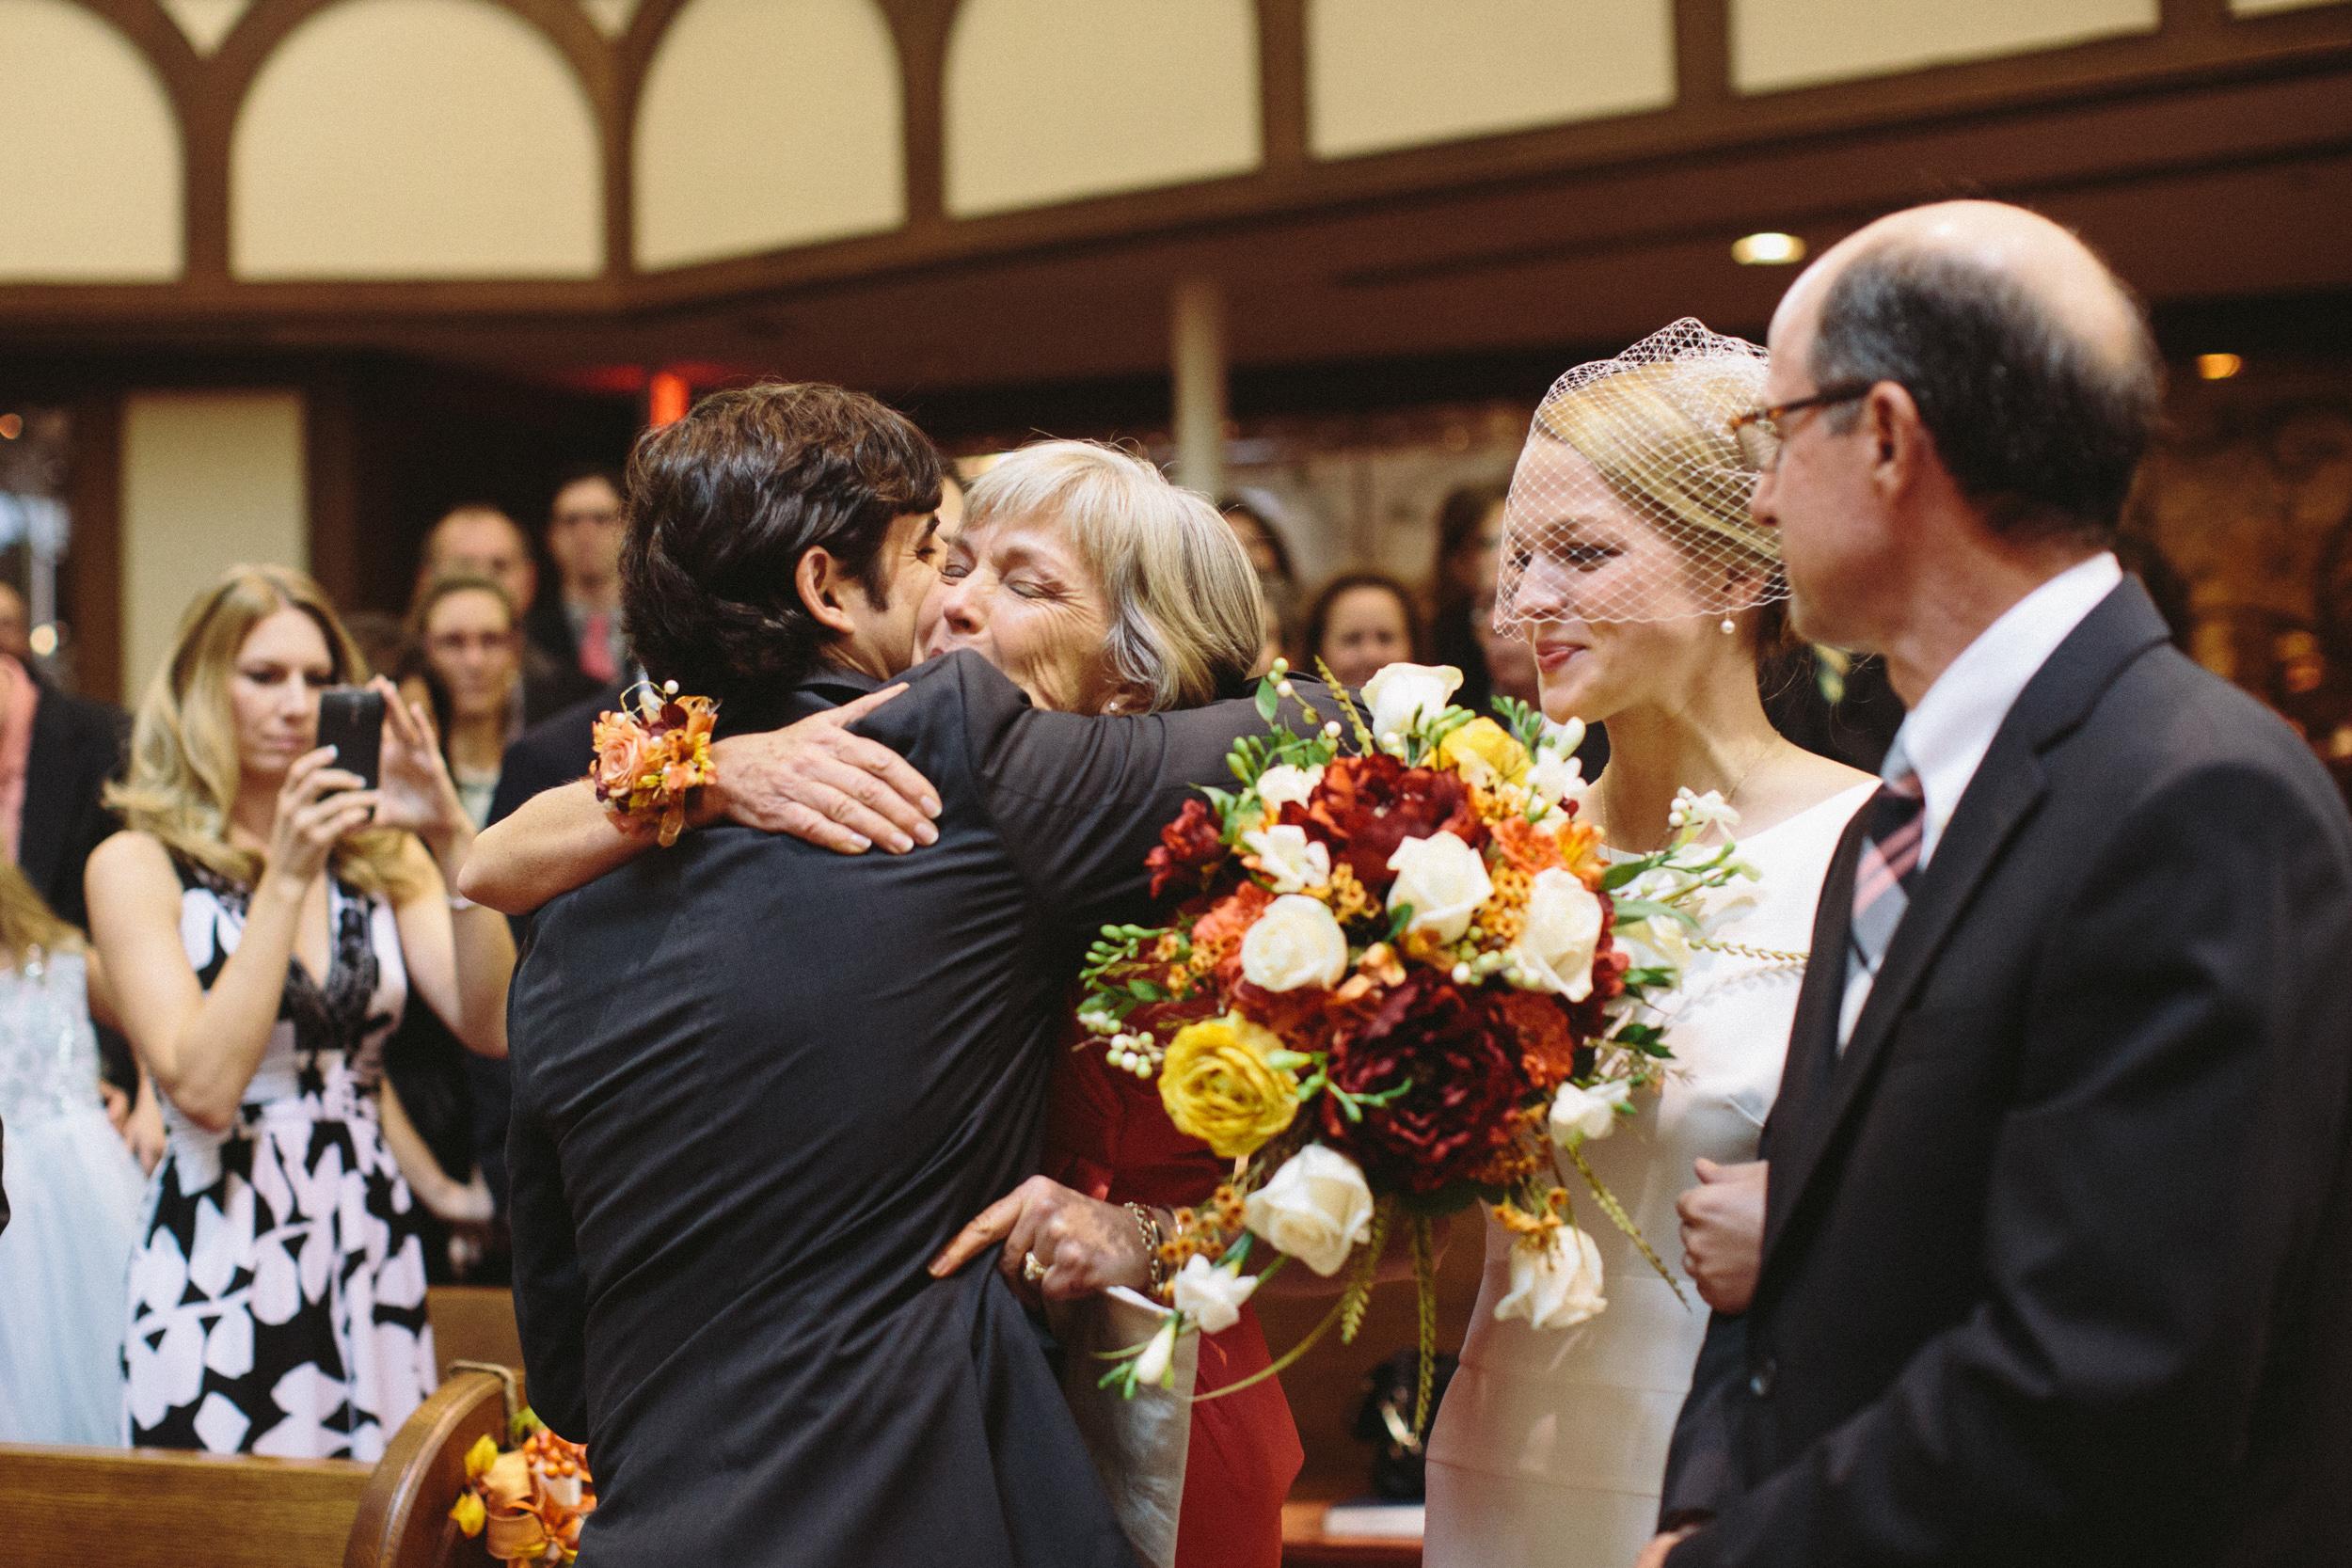 10-05-2013 maggie & adam wedding photography by brian milo-126.jpg